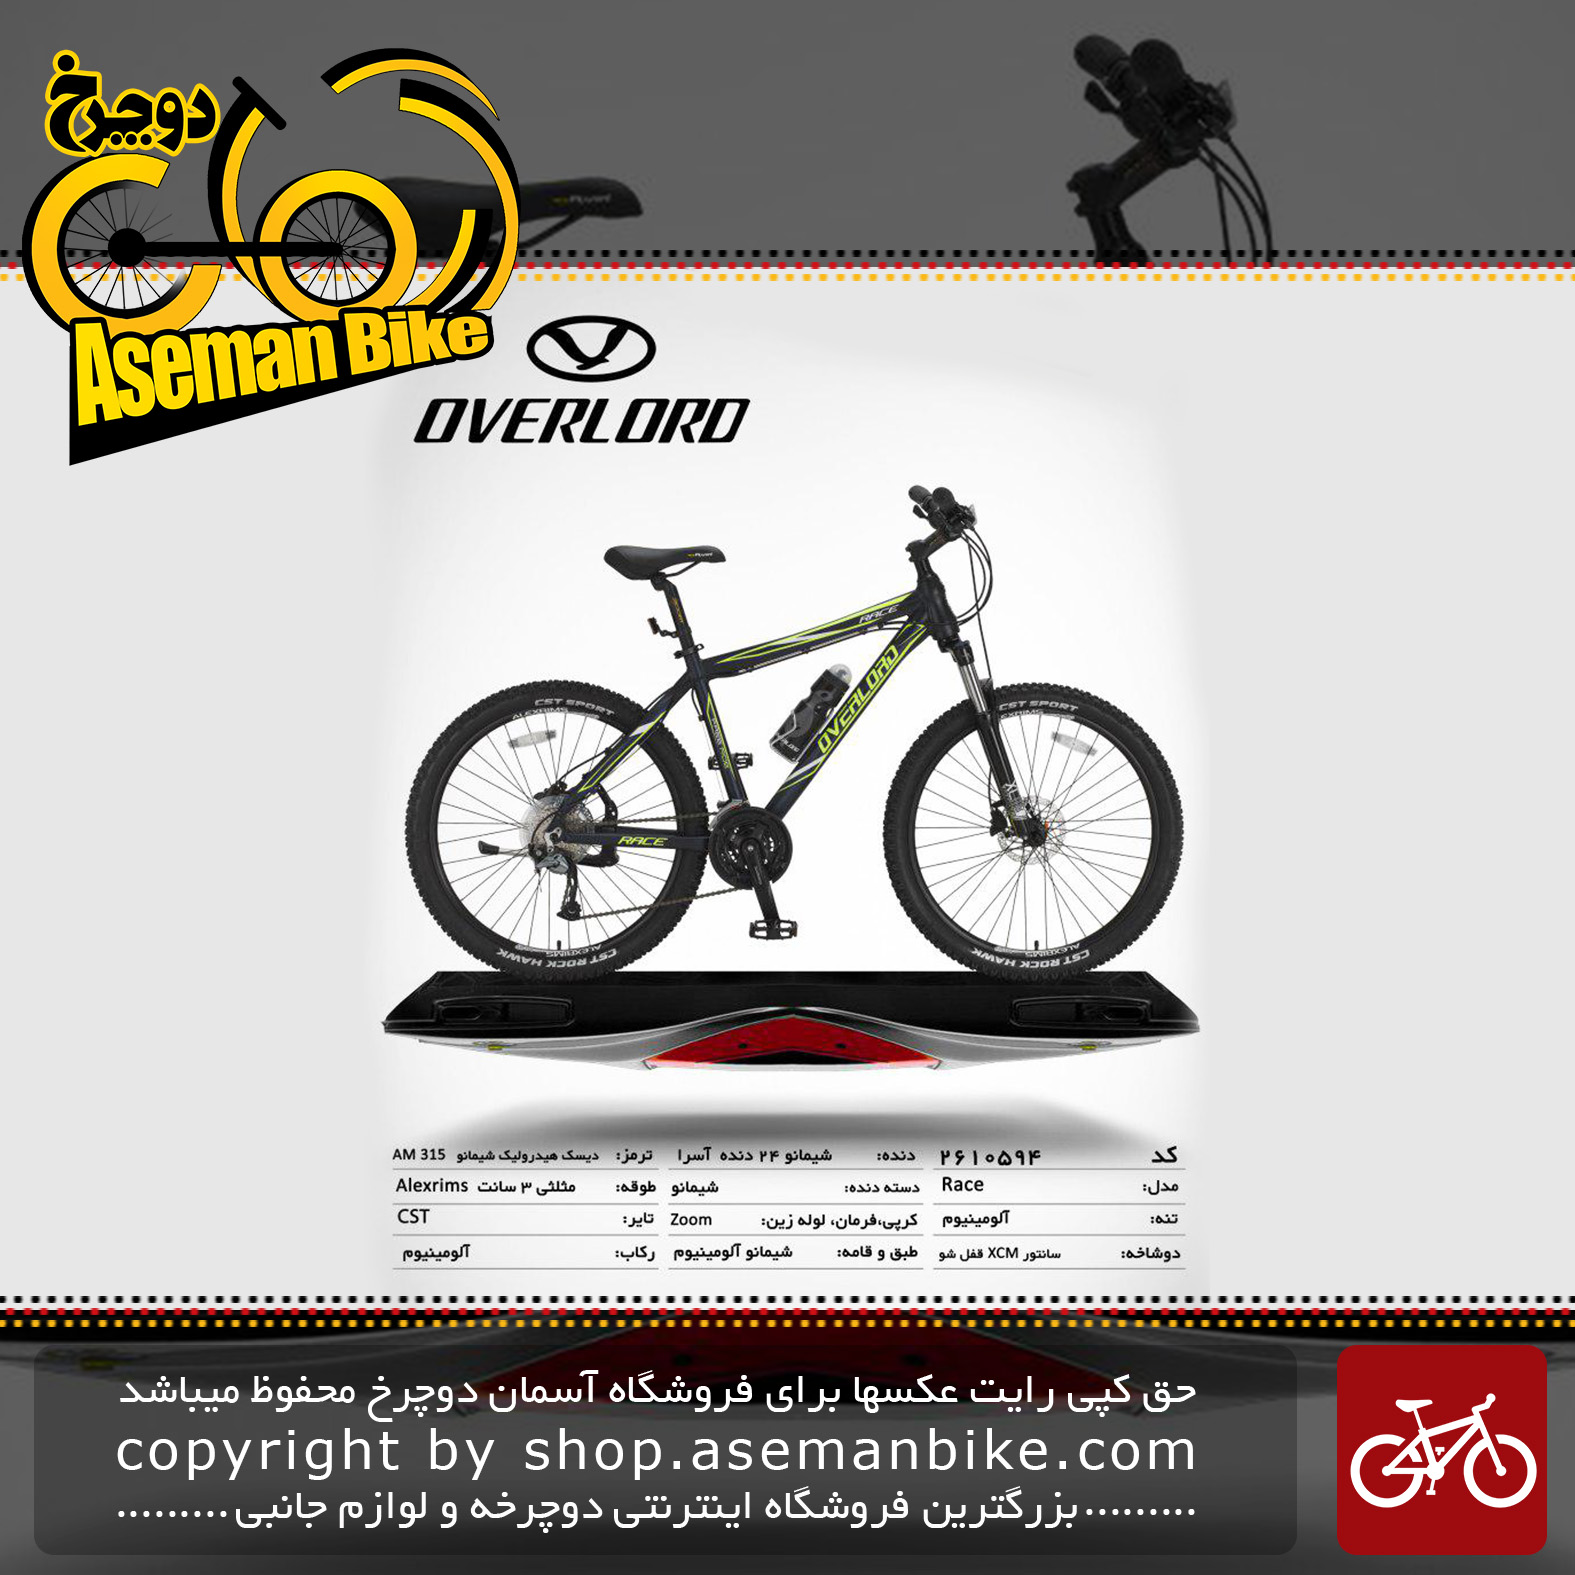 دوچرخه کوهستان شهری اورلرد مدل ریس 24 دنده شیمانو آسرا سایز 26 ساخت تایوان OVERLORD Mountain City Taiwan Bicycle RACE 26 2019